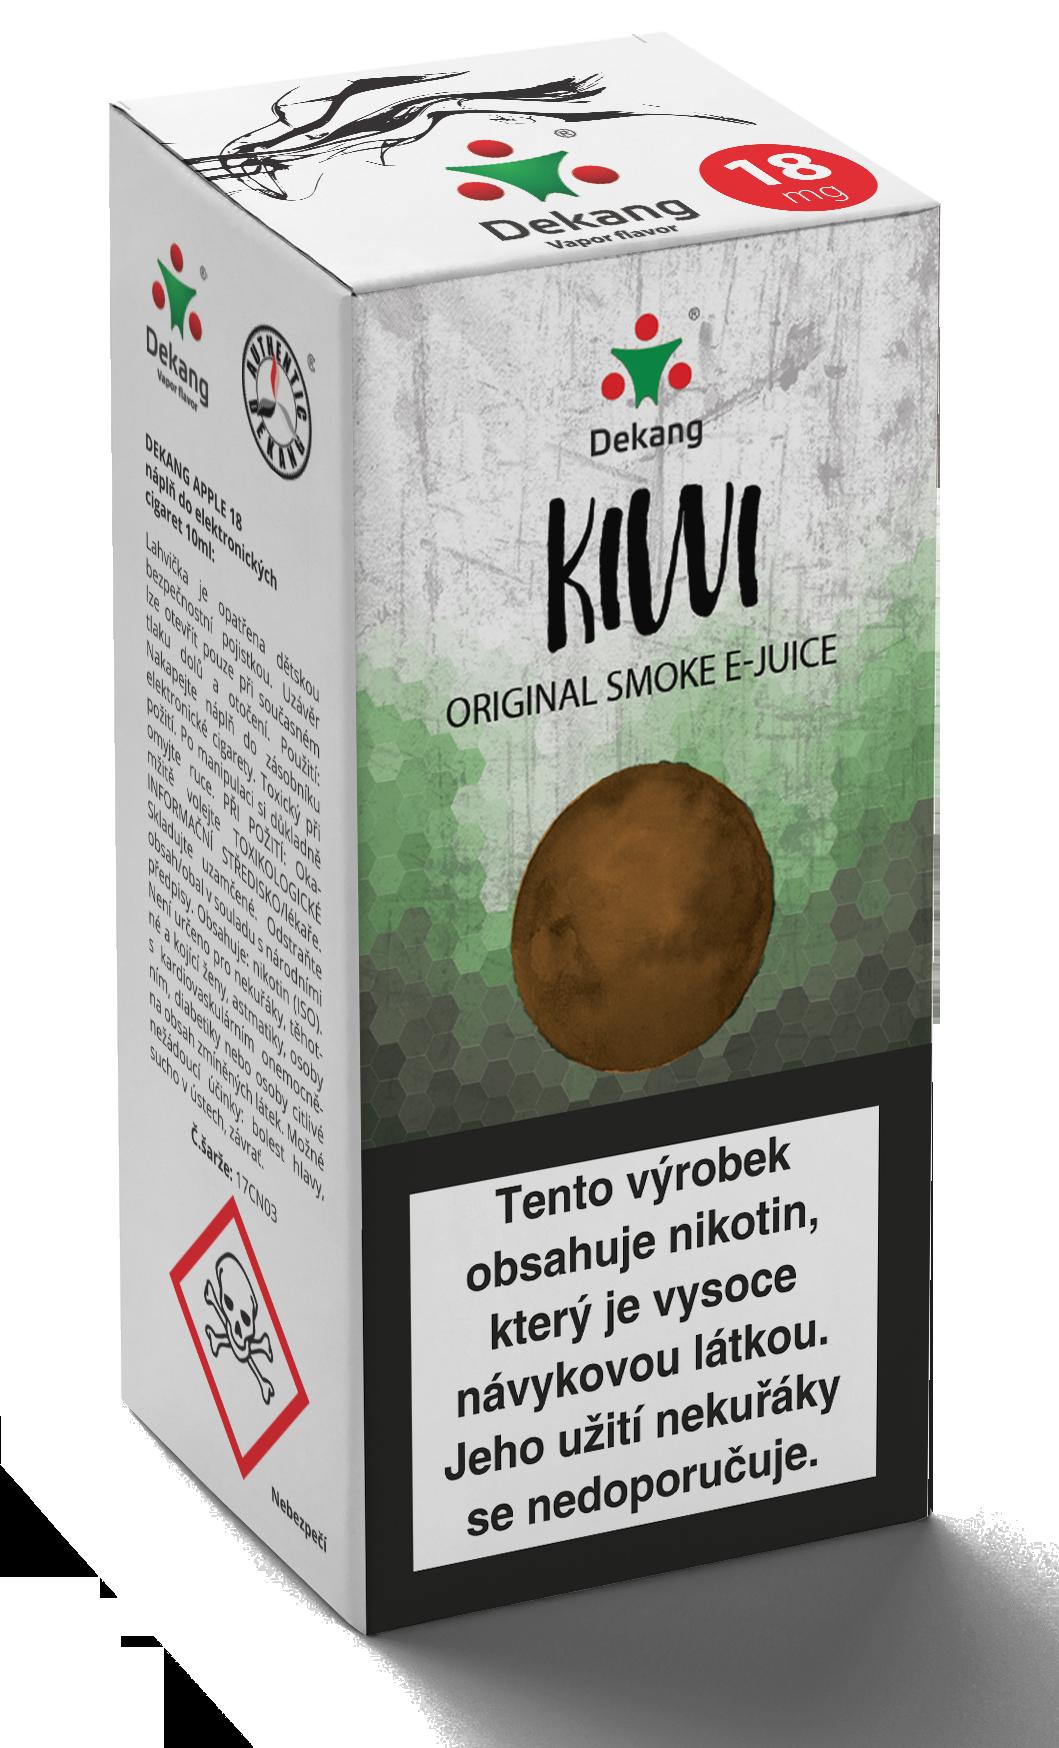 E-liquid Dekang 10ml Kiwi Množství nikotinu: 0mg